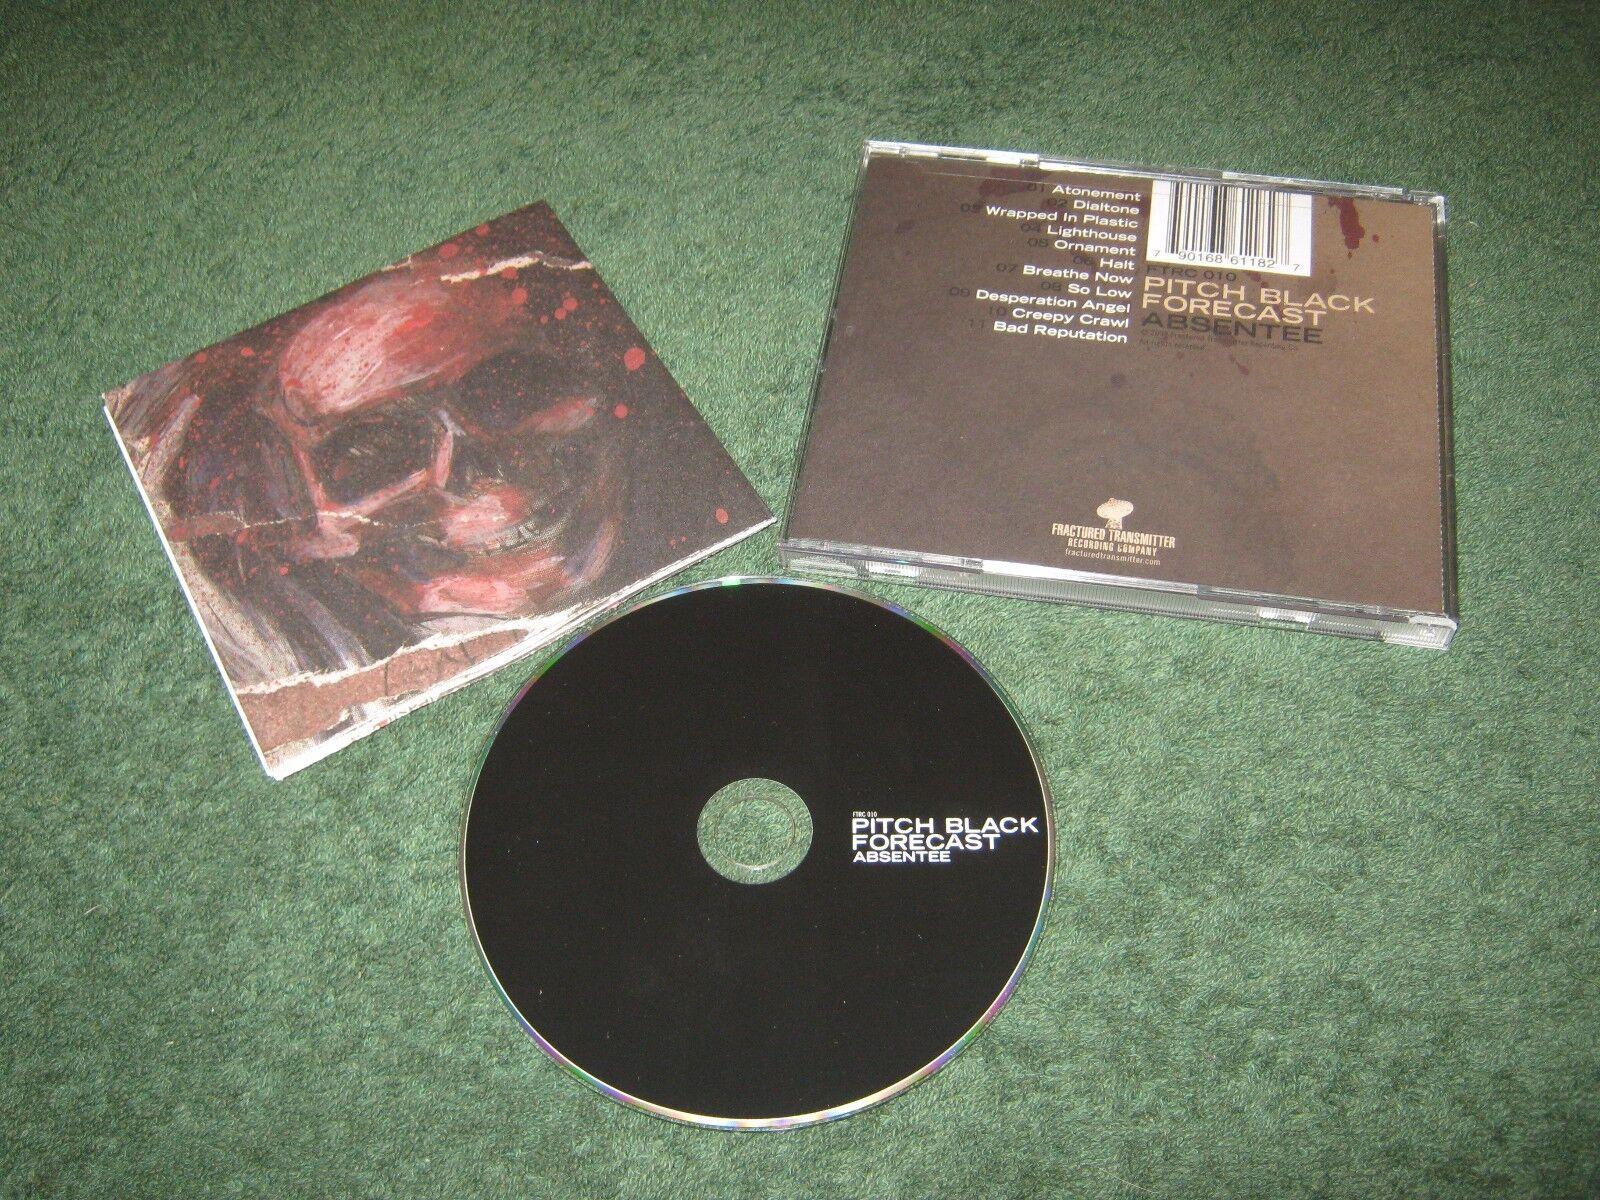 Pitch Black Forecast - Absentee (cd) j mann mushroomhead jason popson